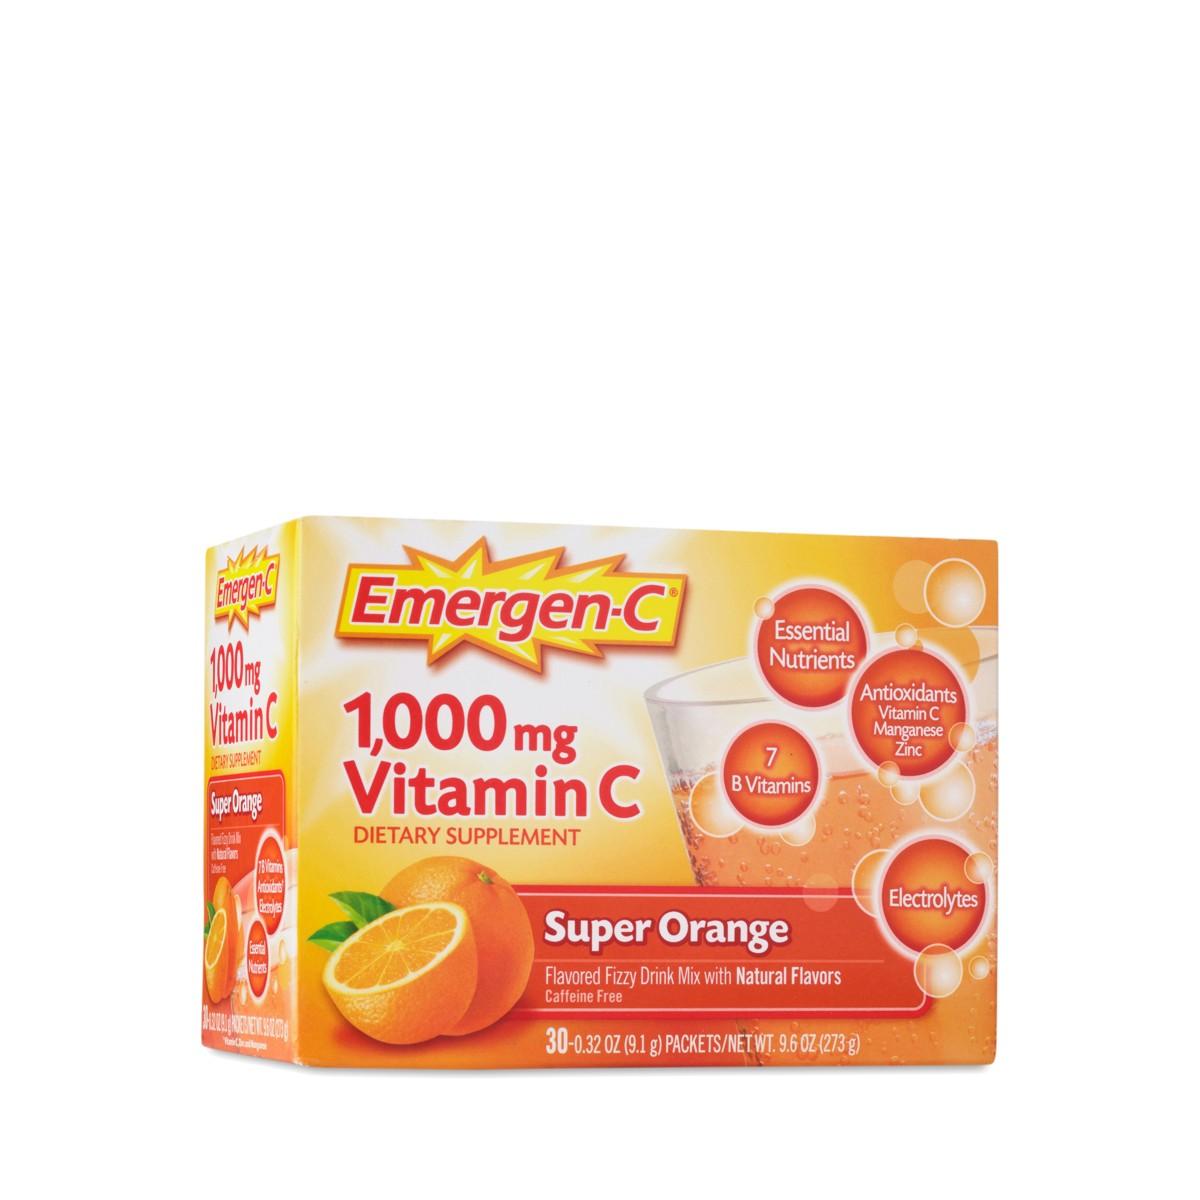 amoxil suspension dosage for children